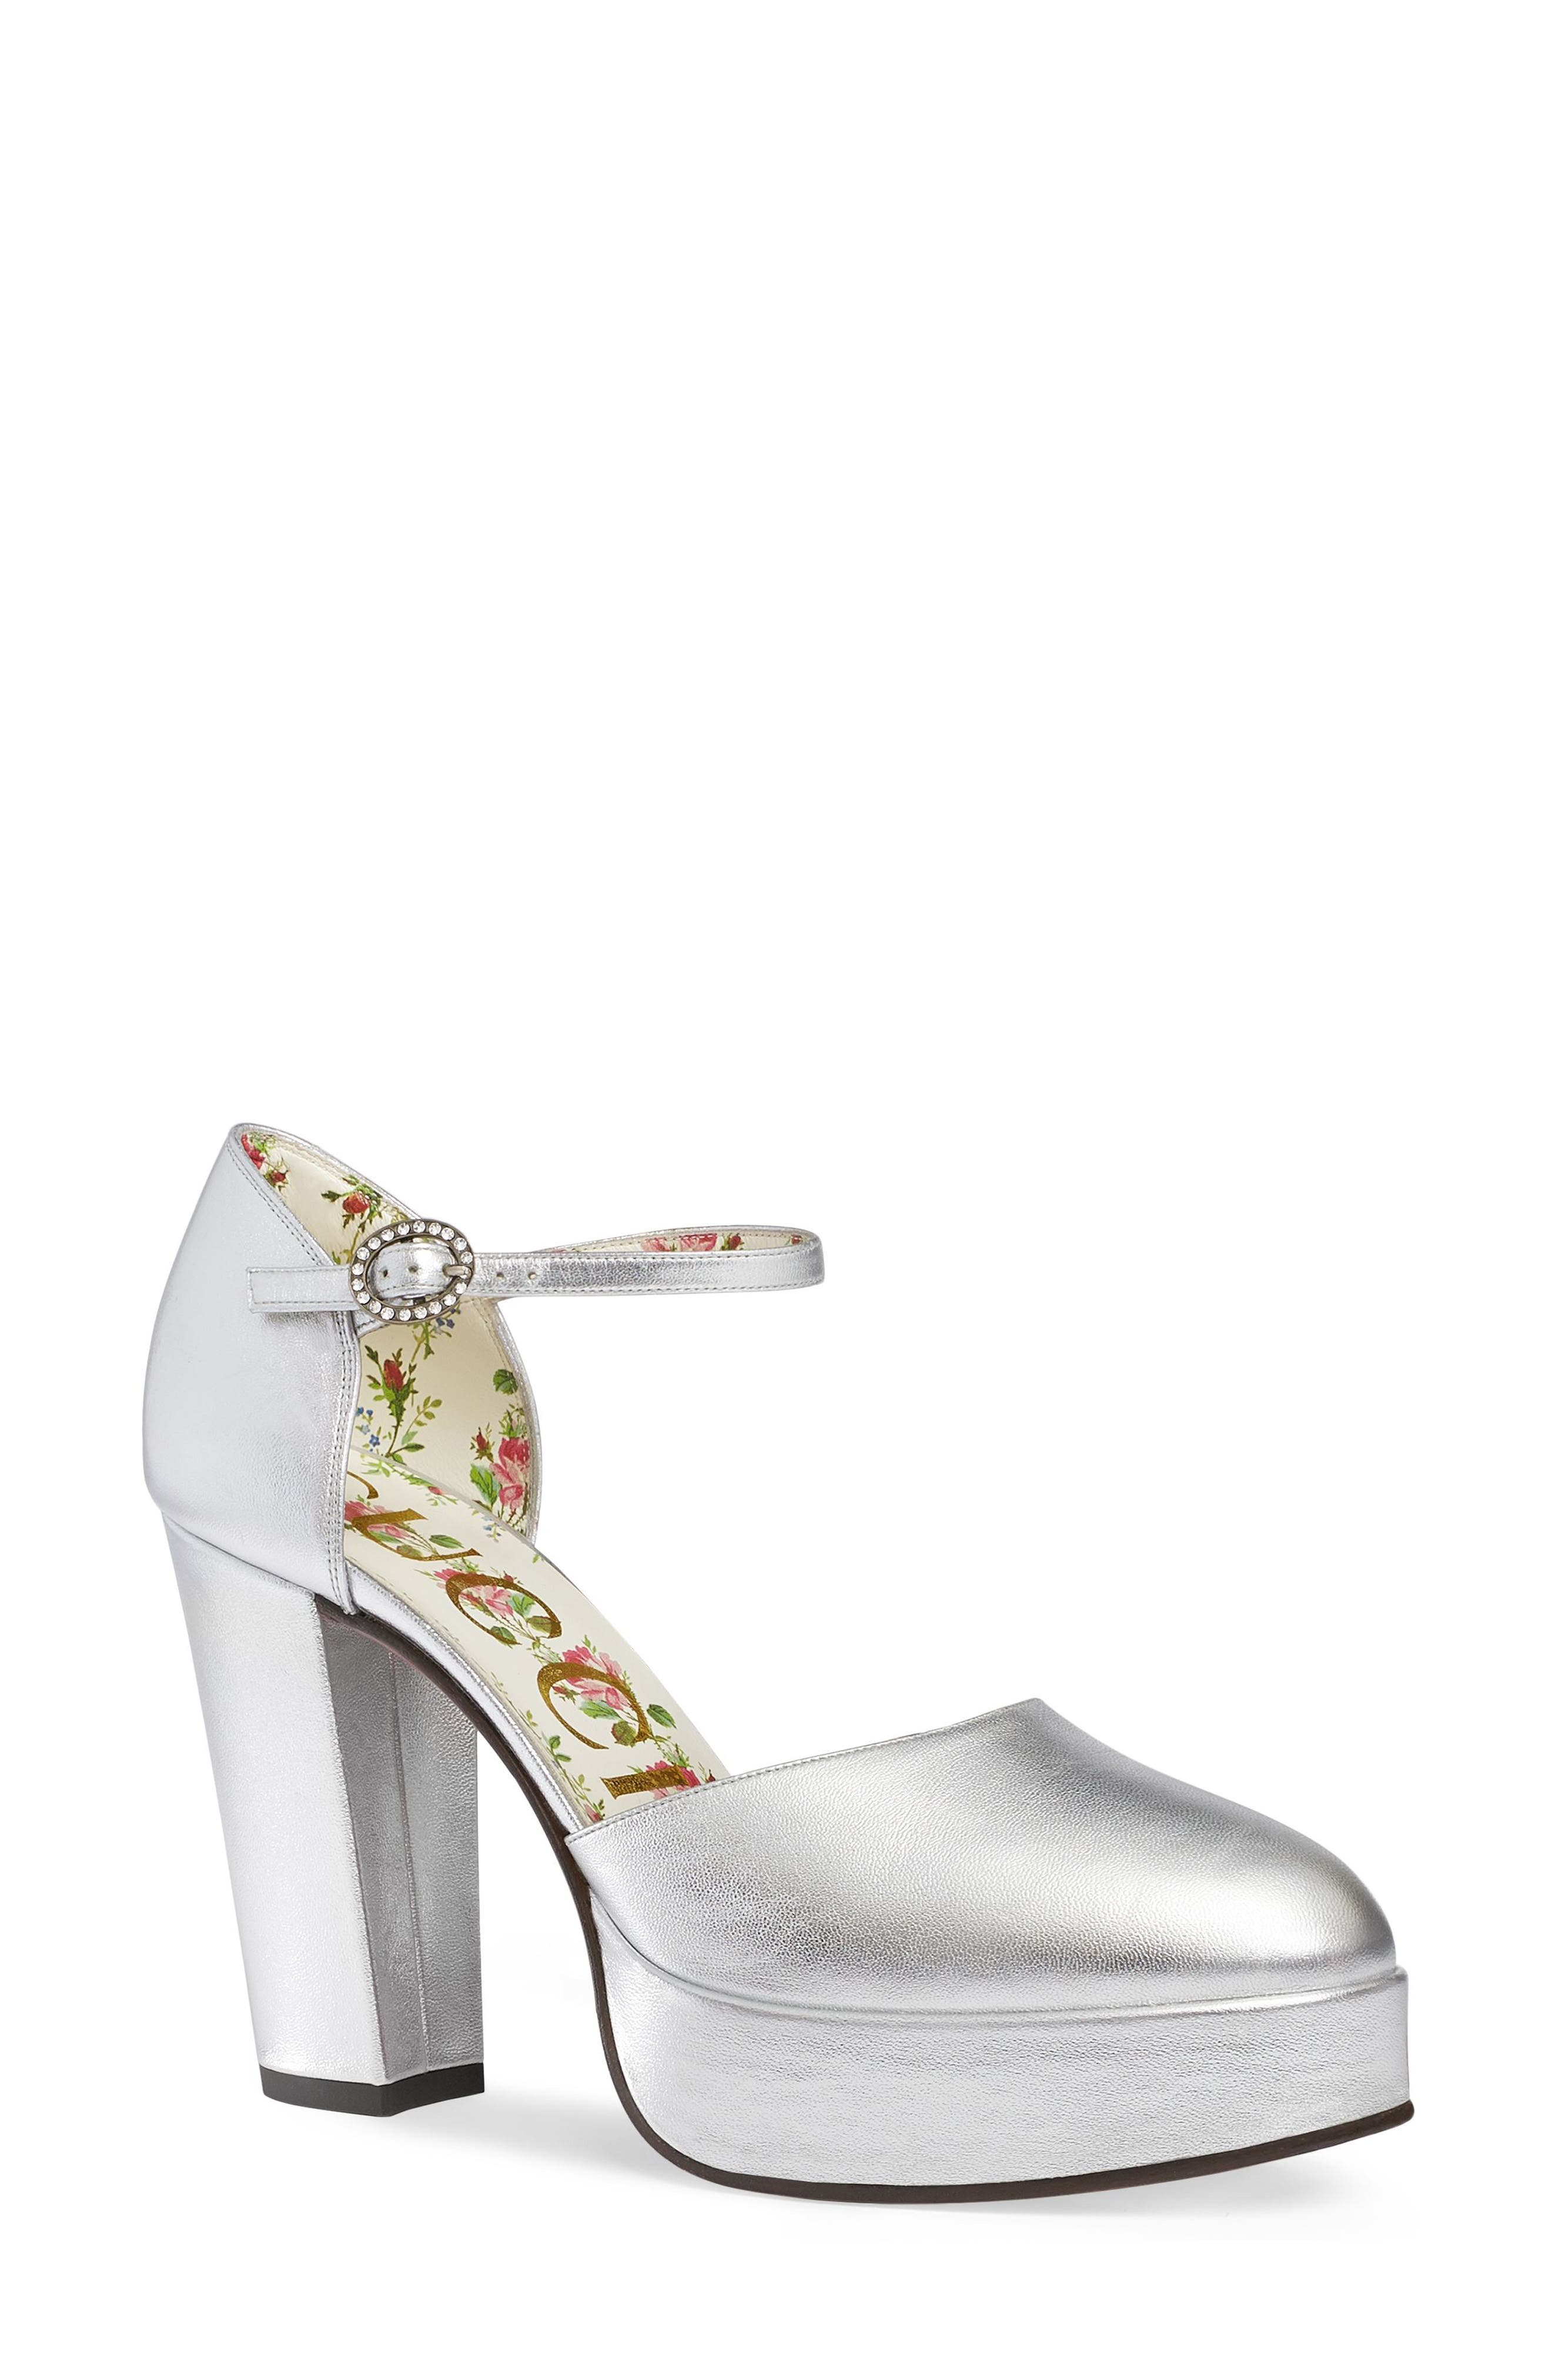 Main Image - Gucci Agon Ankle Strap Platform Pump (Women)